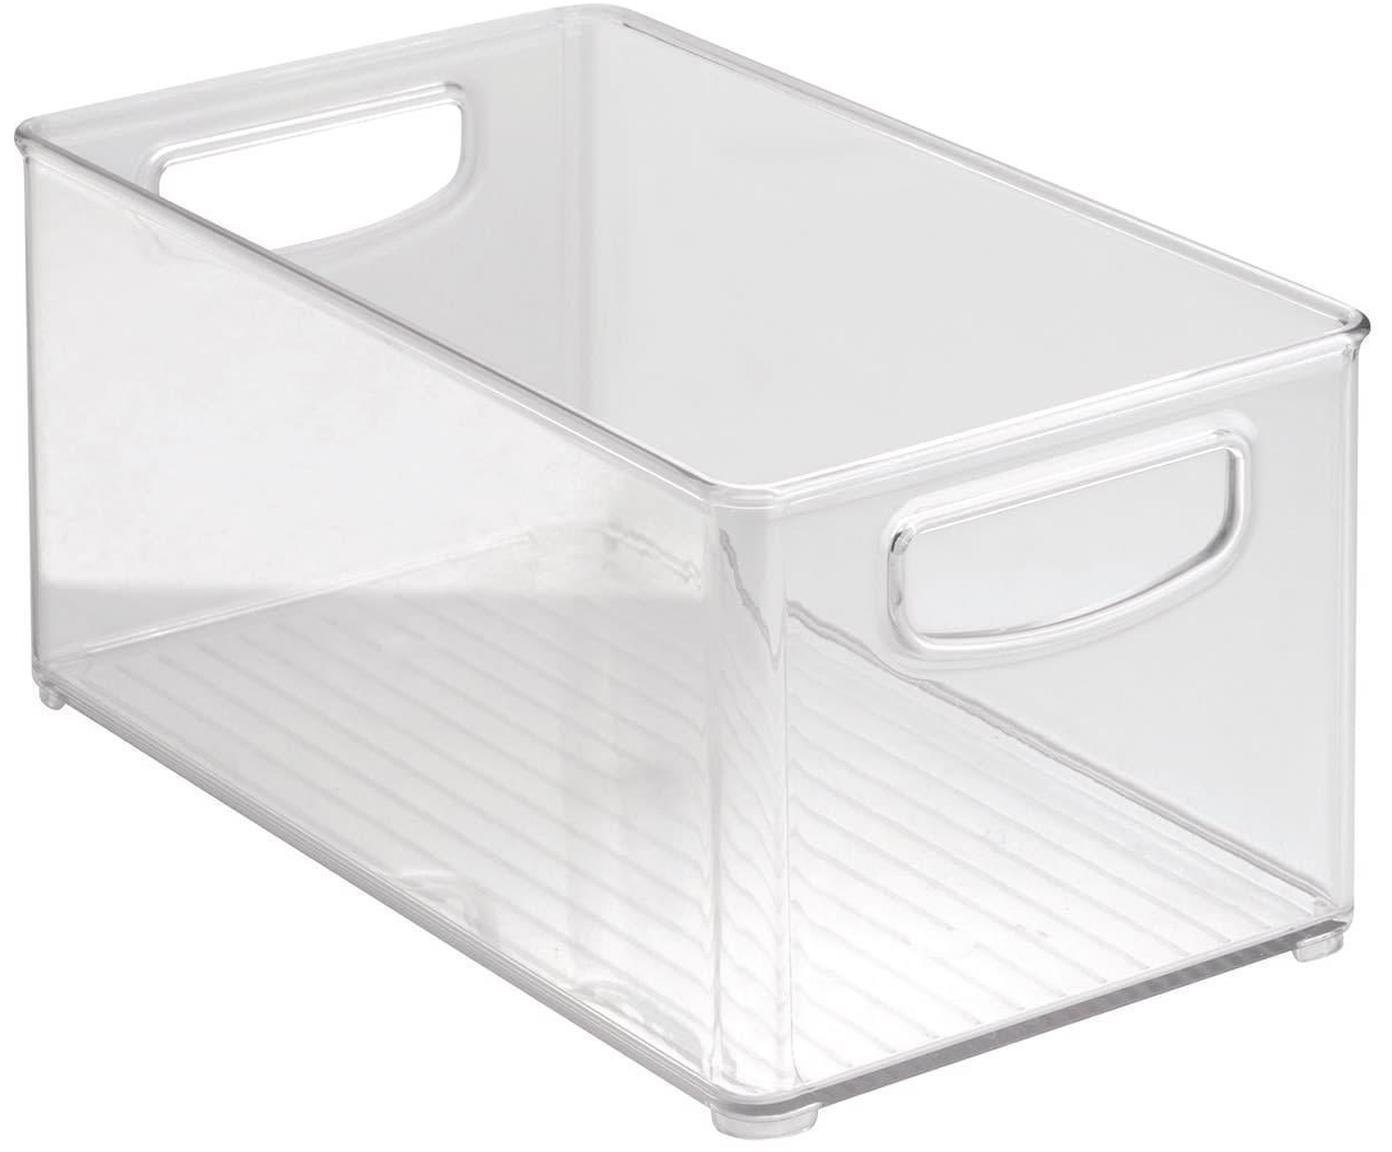 Organizador de cocina Linus, Plástico, Transparente, An 15 x F 25 cm